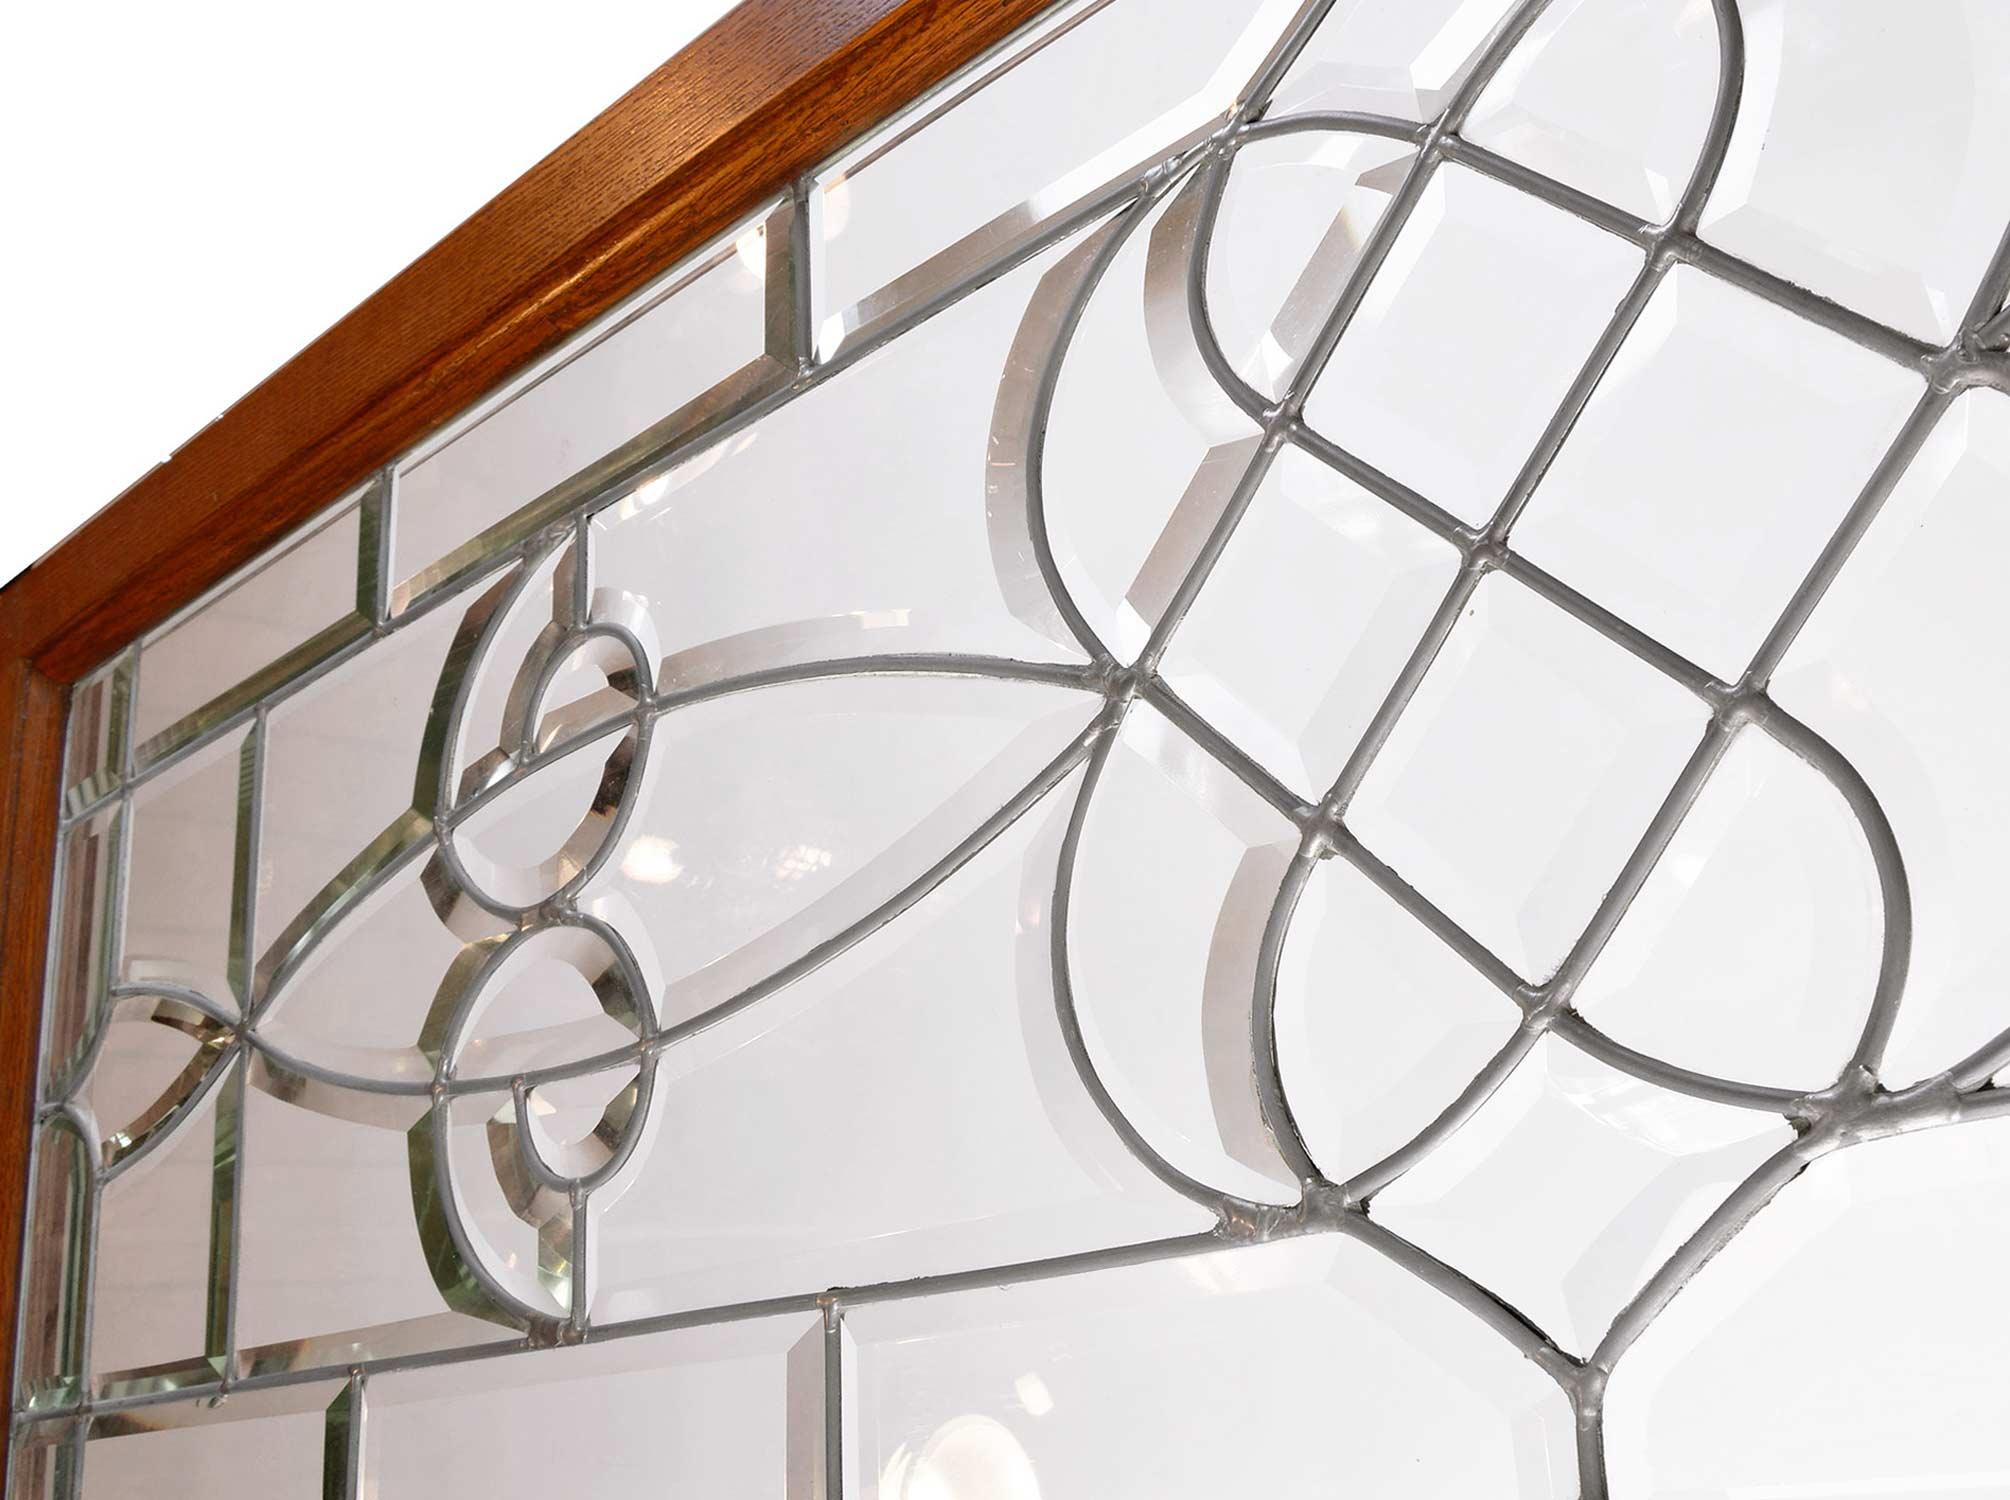 46387-beveled-scroll-window-detail.jpg